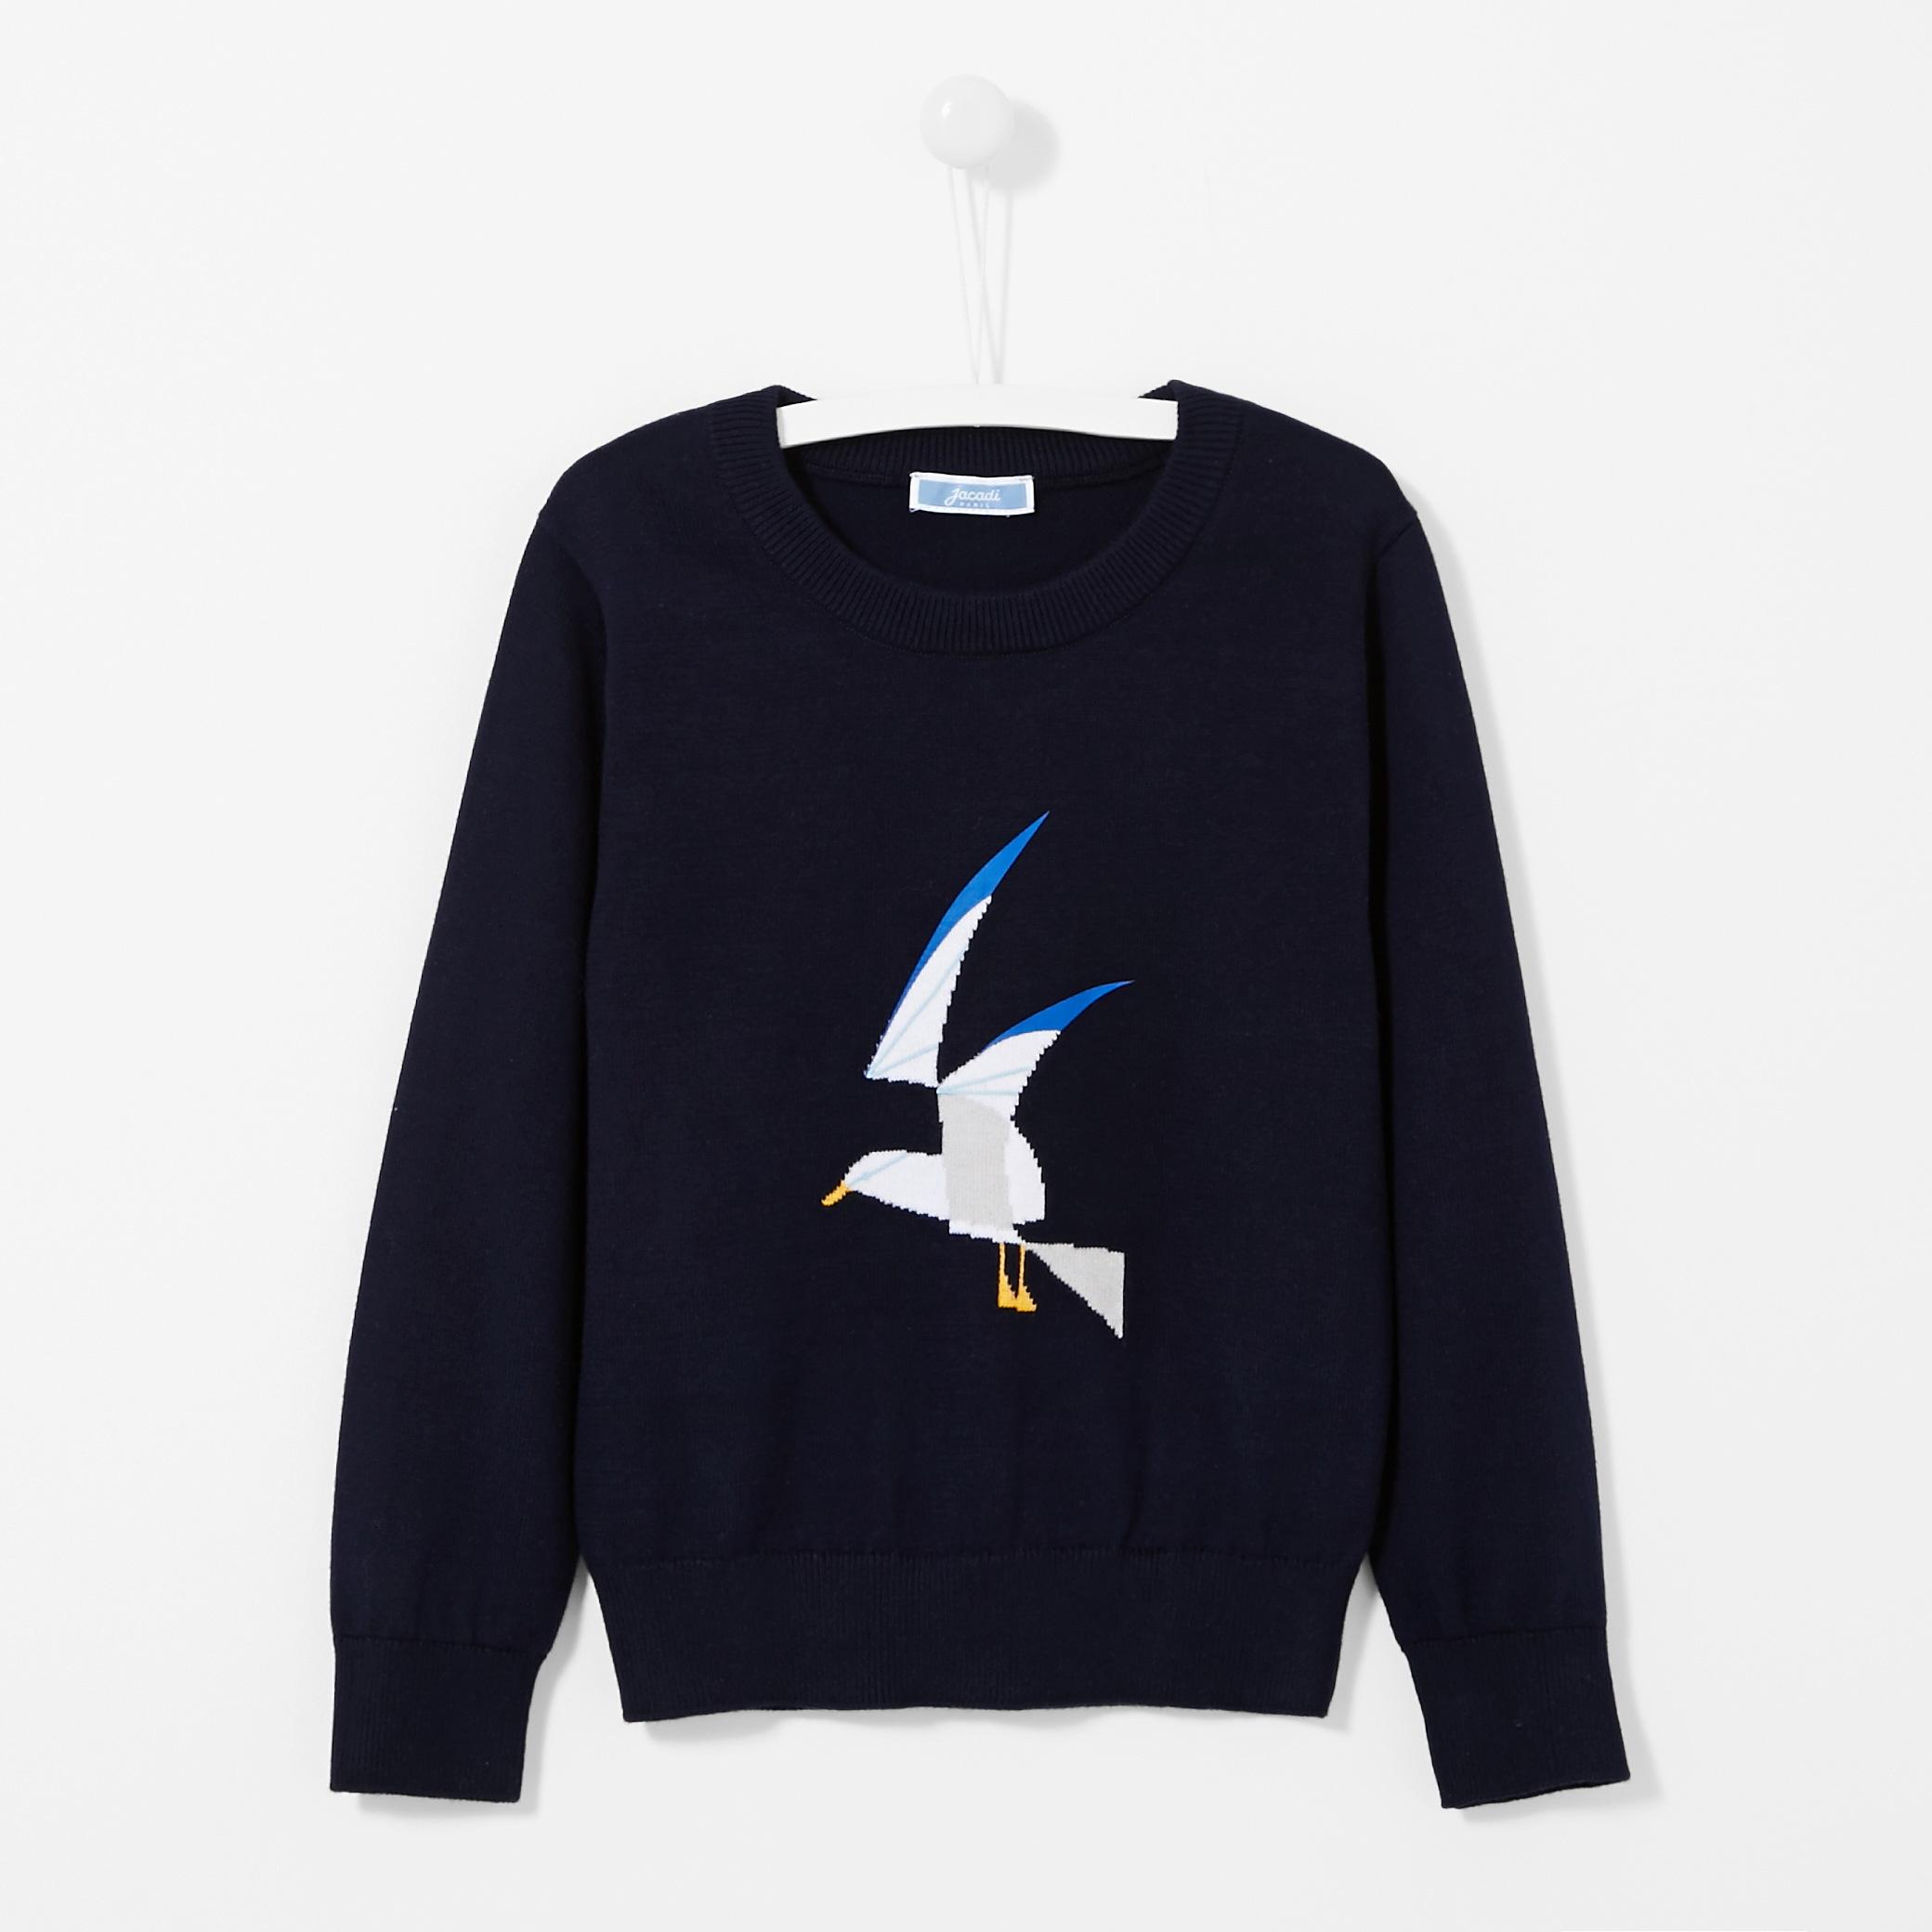 seagull-sweater.jpg